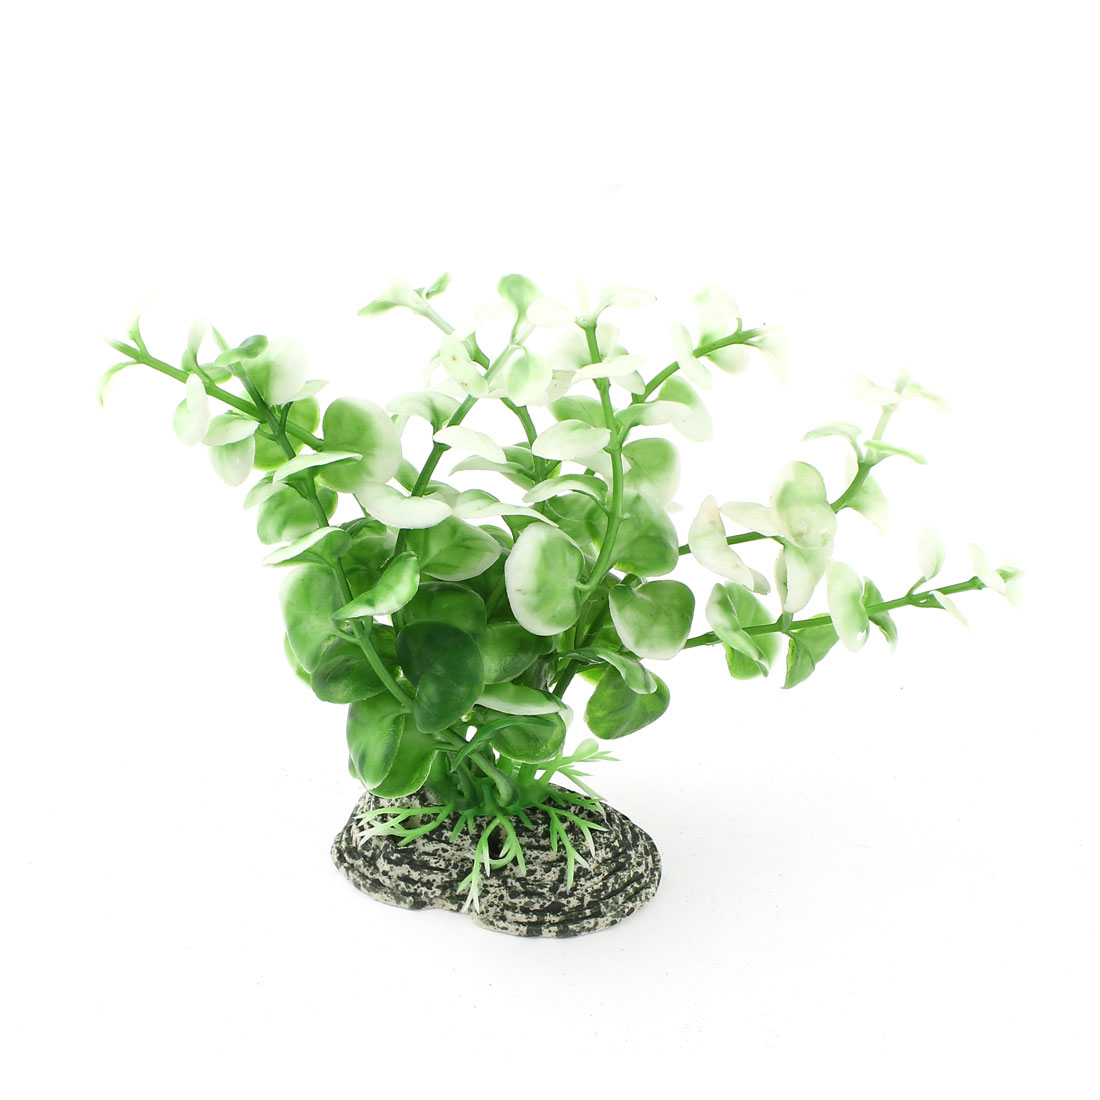 Unique Bargains Green White Plastic Emulation Grass Water Plant 12cm High Accent for Aquarium